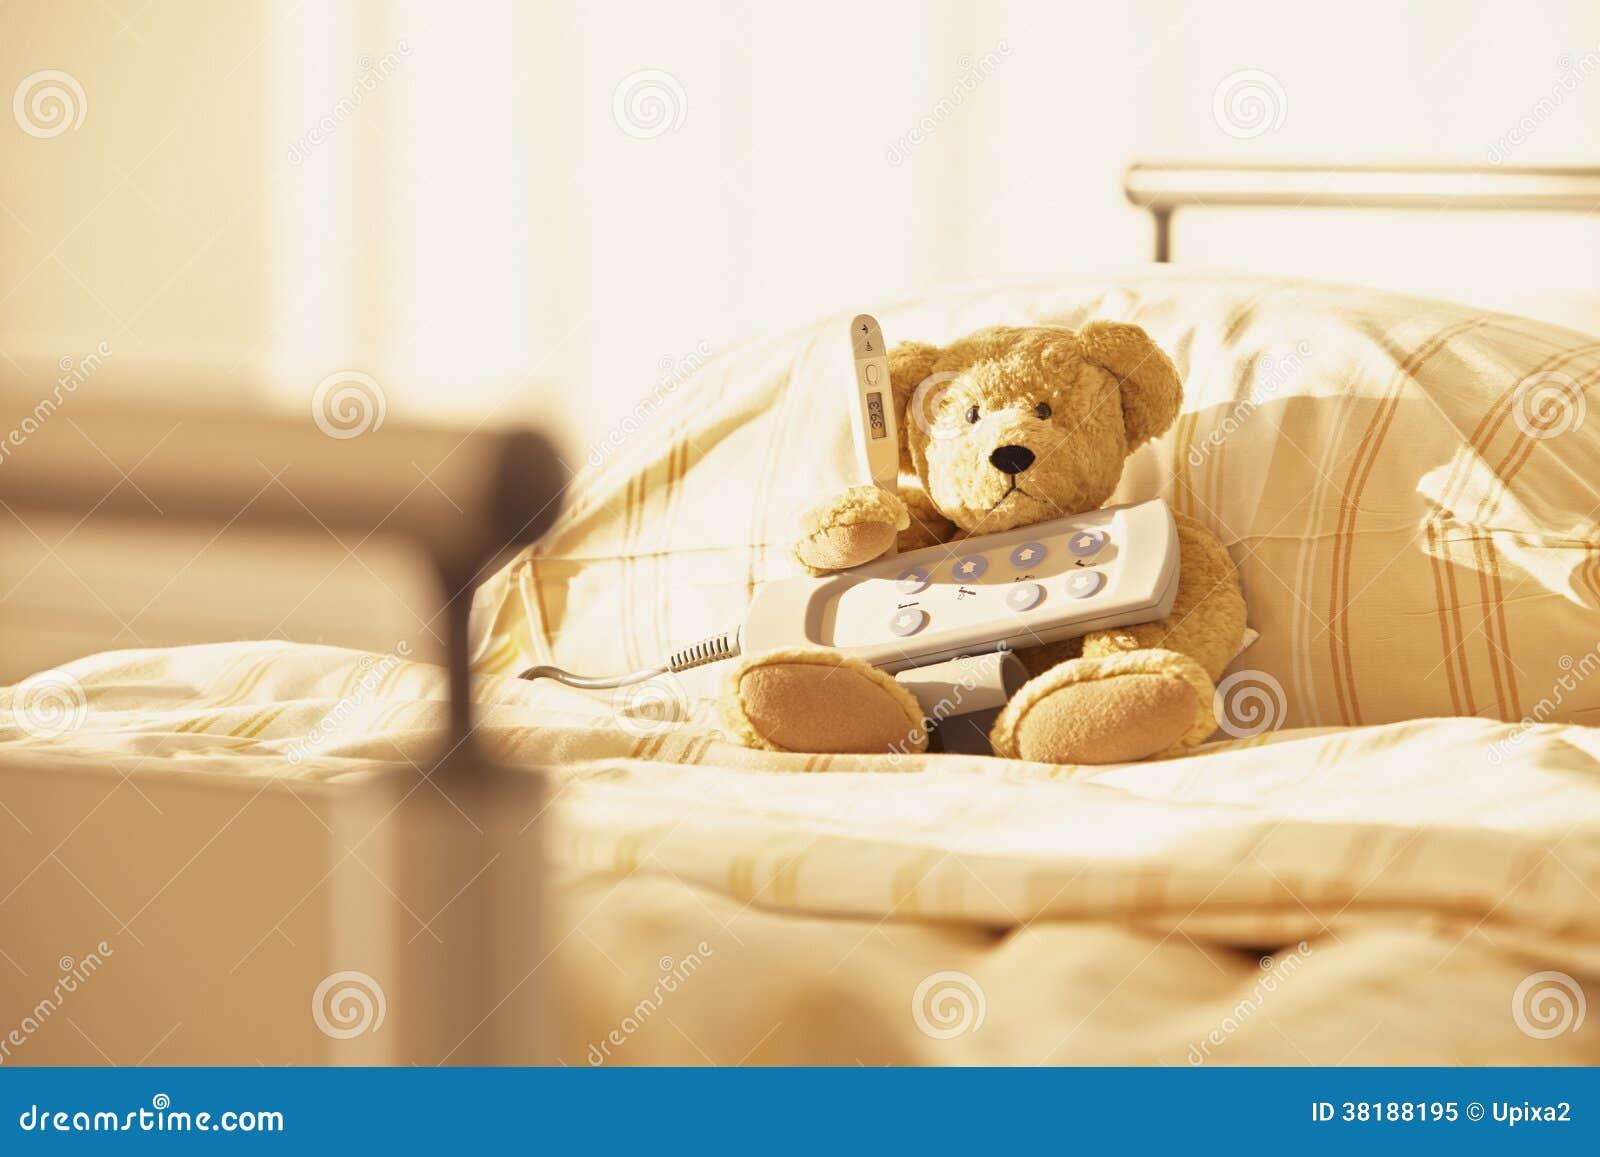 Hospital Bed Remote